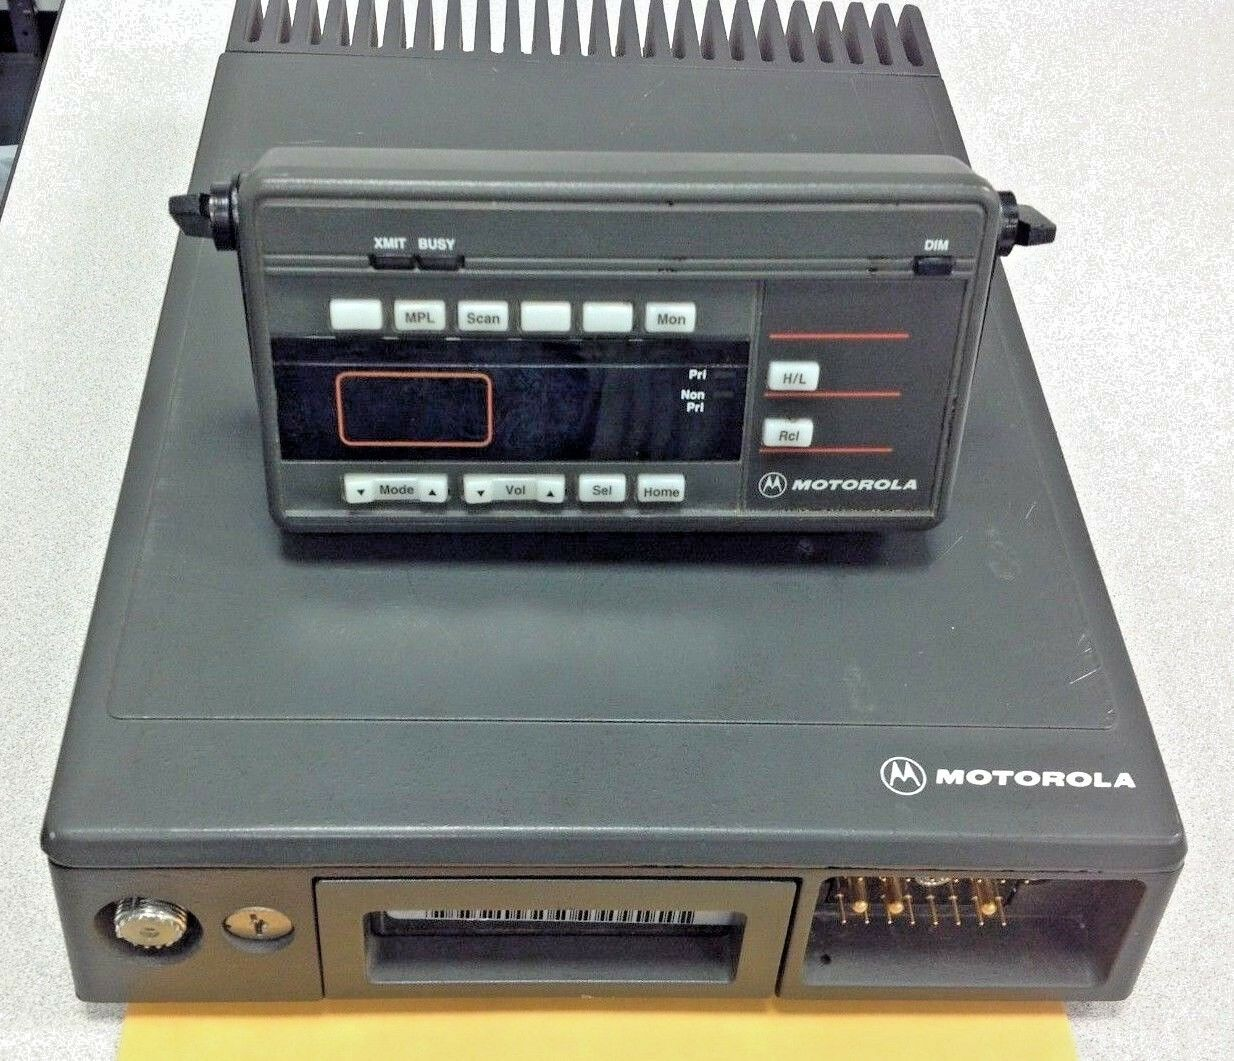 Motorola Maratrac Model # T73XTA7TA7BK, 150-174 MHz, 99 CH, Remote Control Head. Buy it now for 120.00